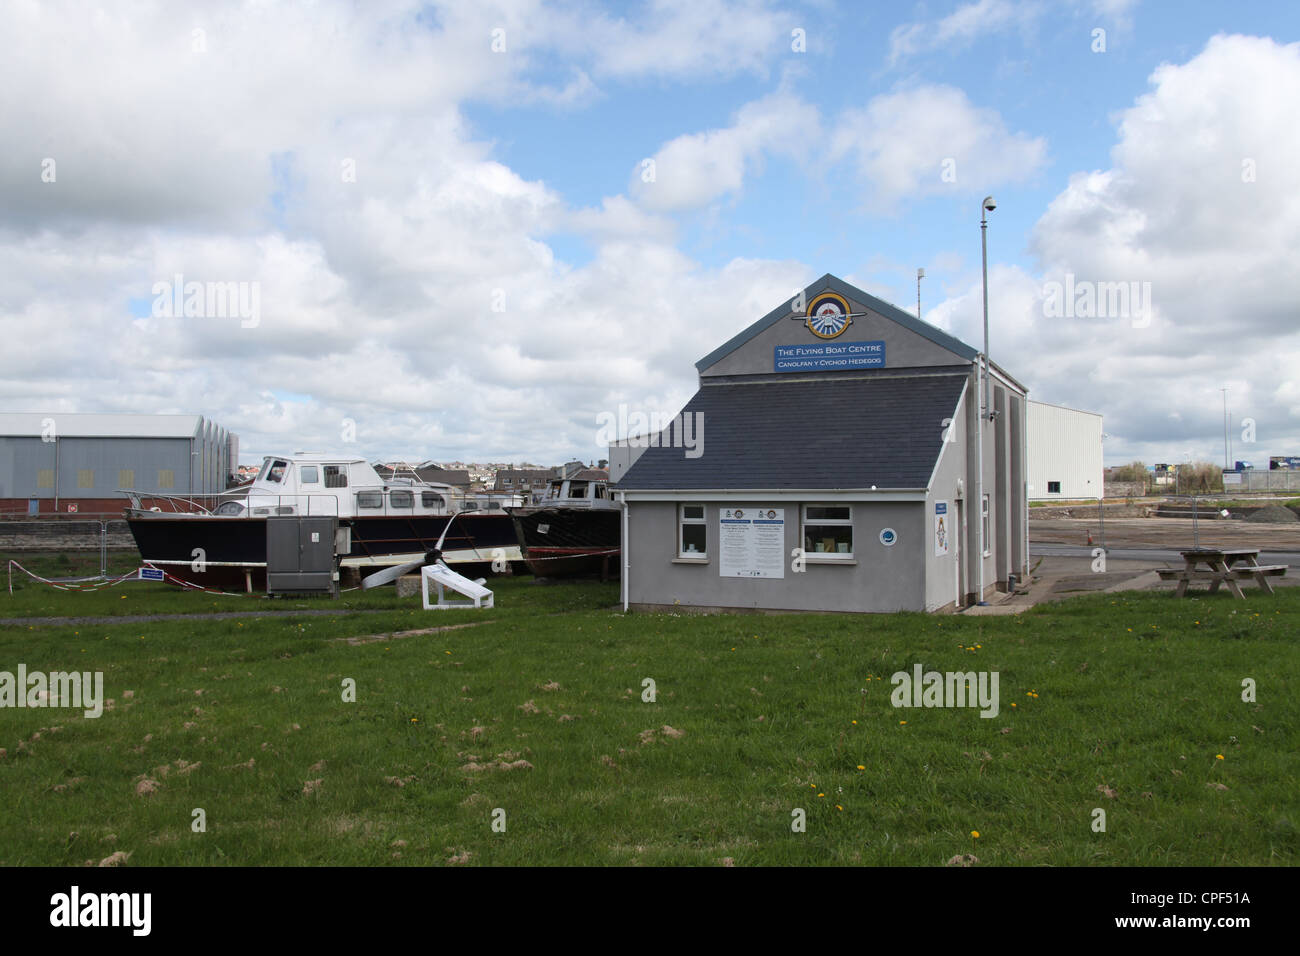 The Flying Boat Visitor Centre in Pembroke Dock - Stock Image